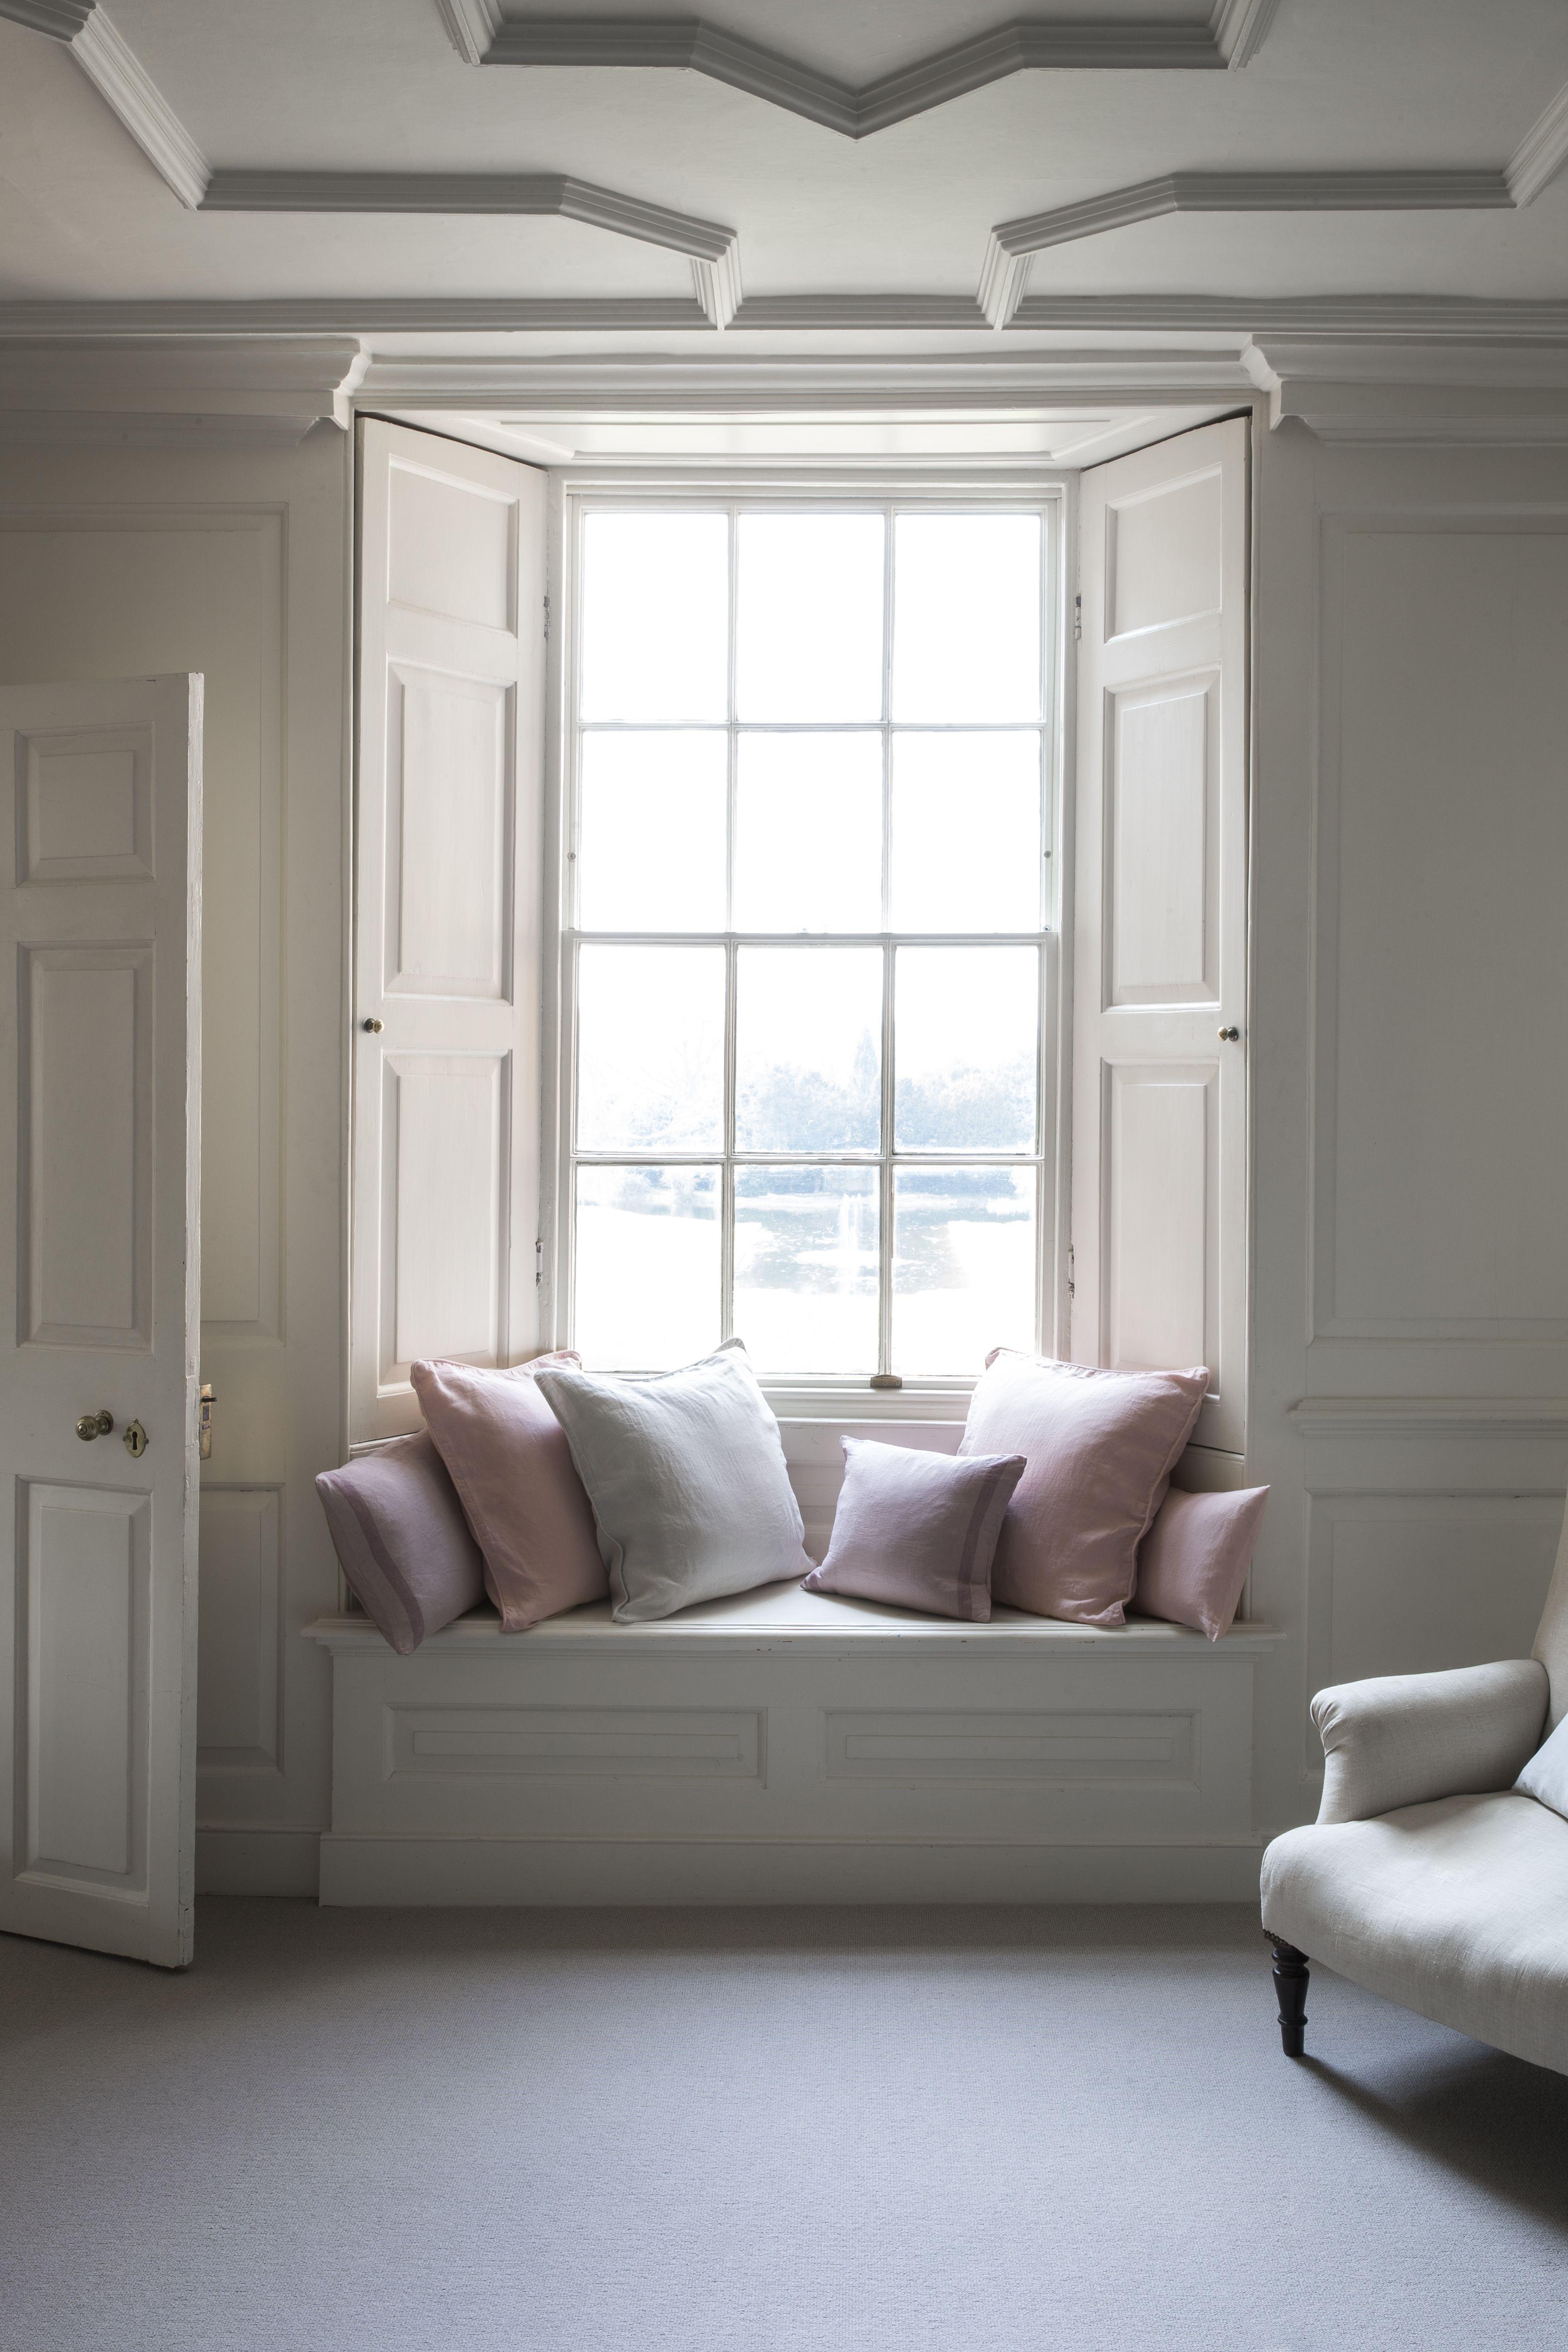 bay window sofa seating set manila philippines more ideas below diy windows exterior nook